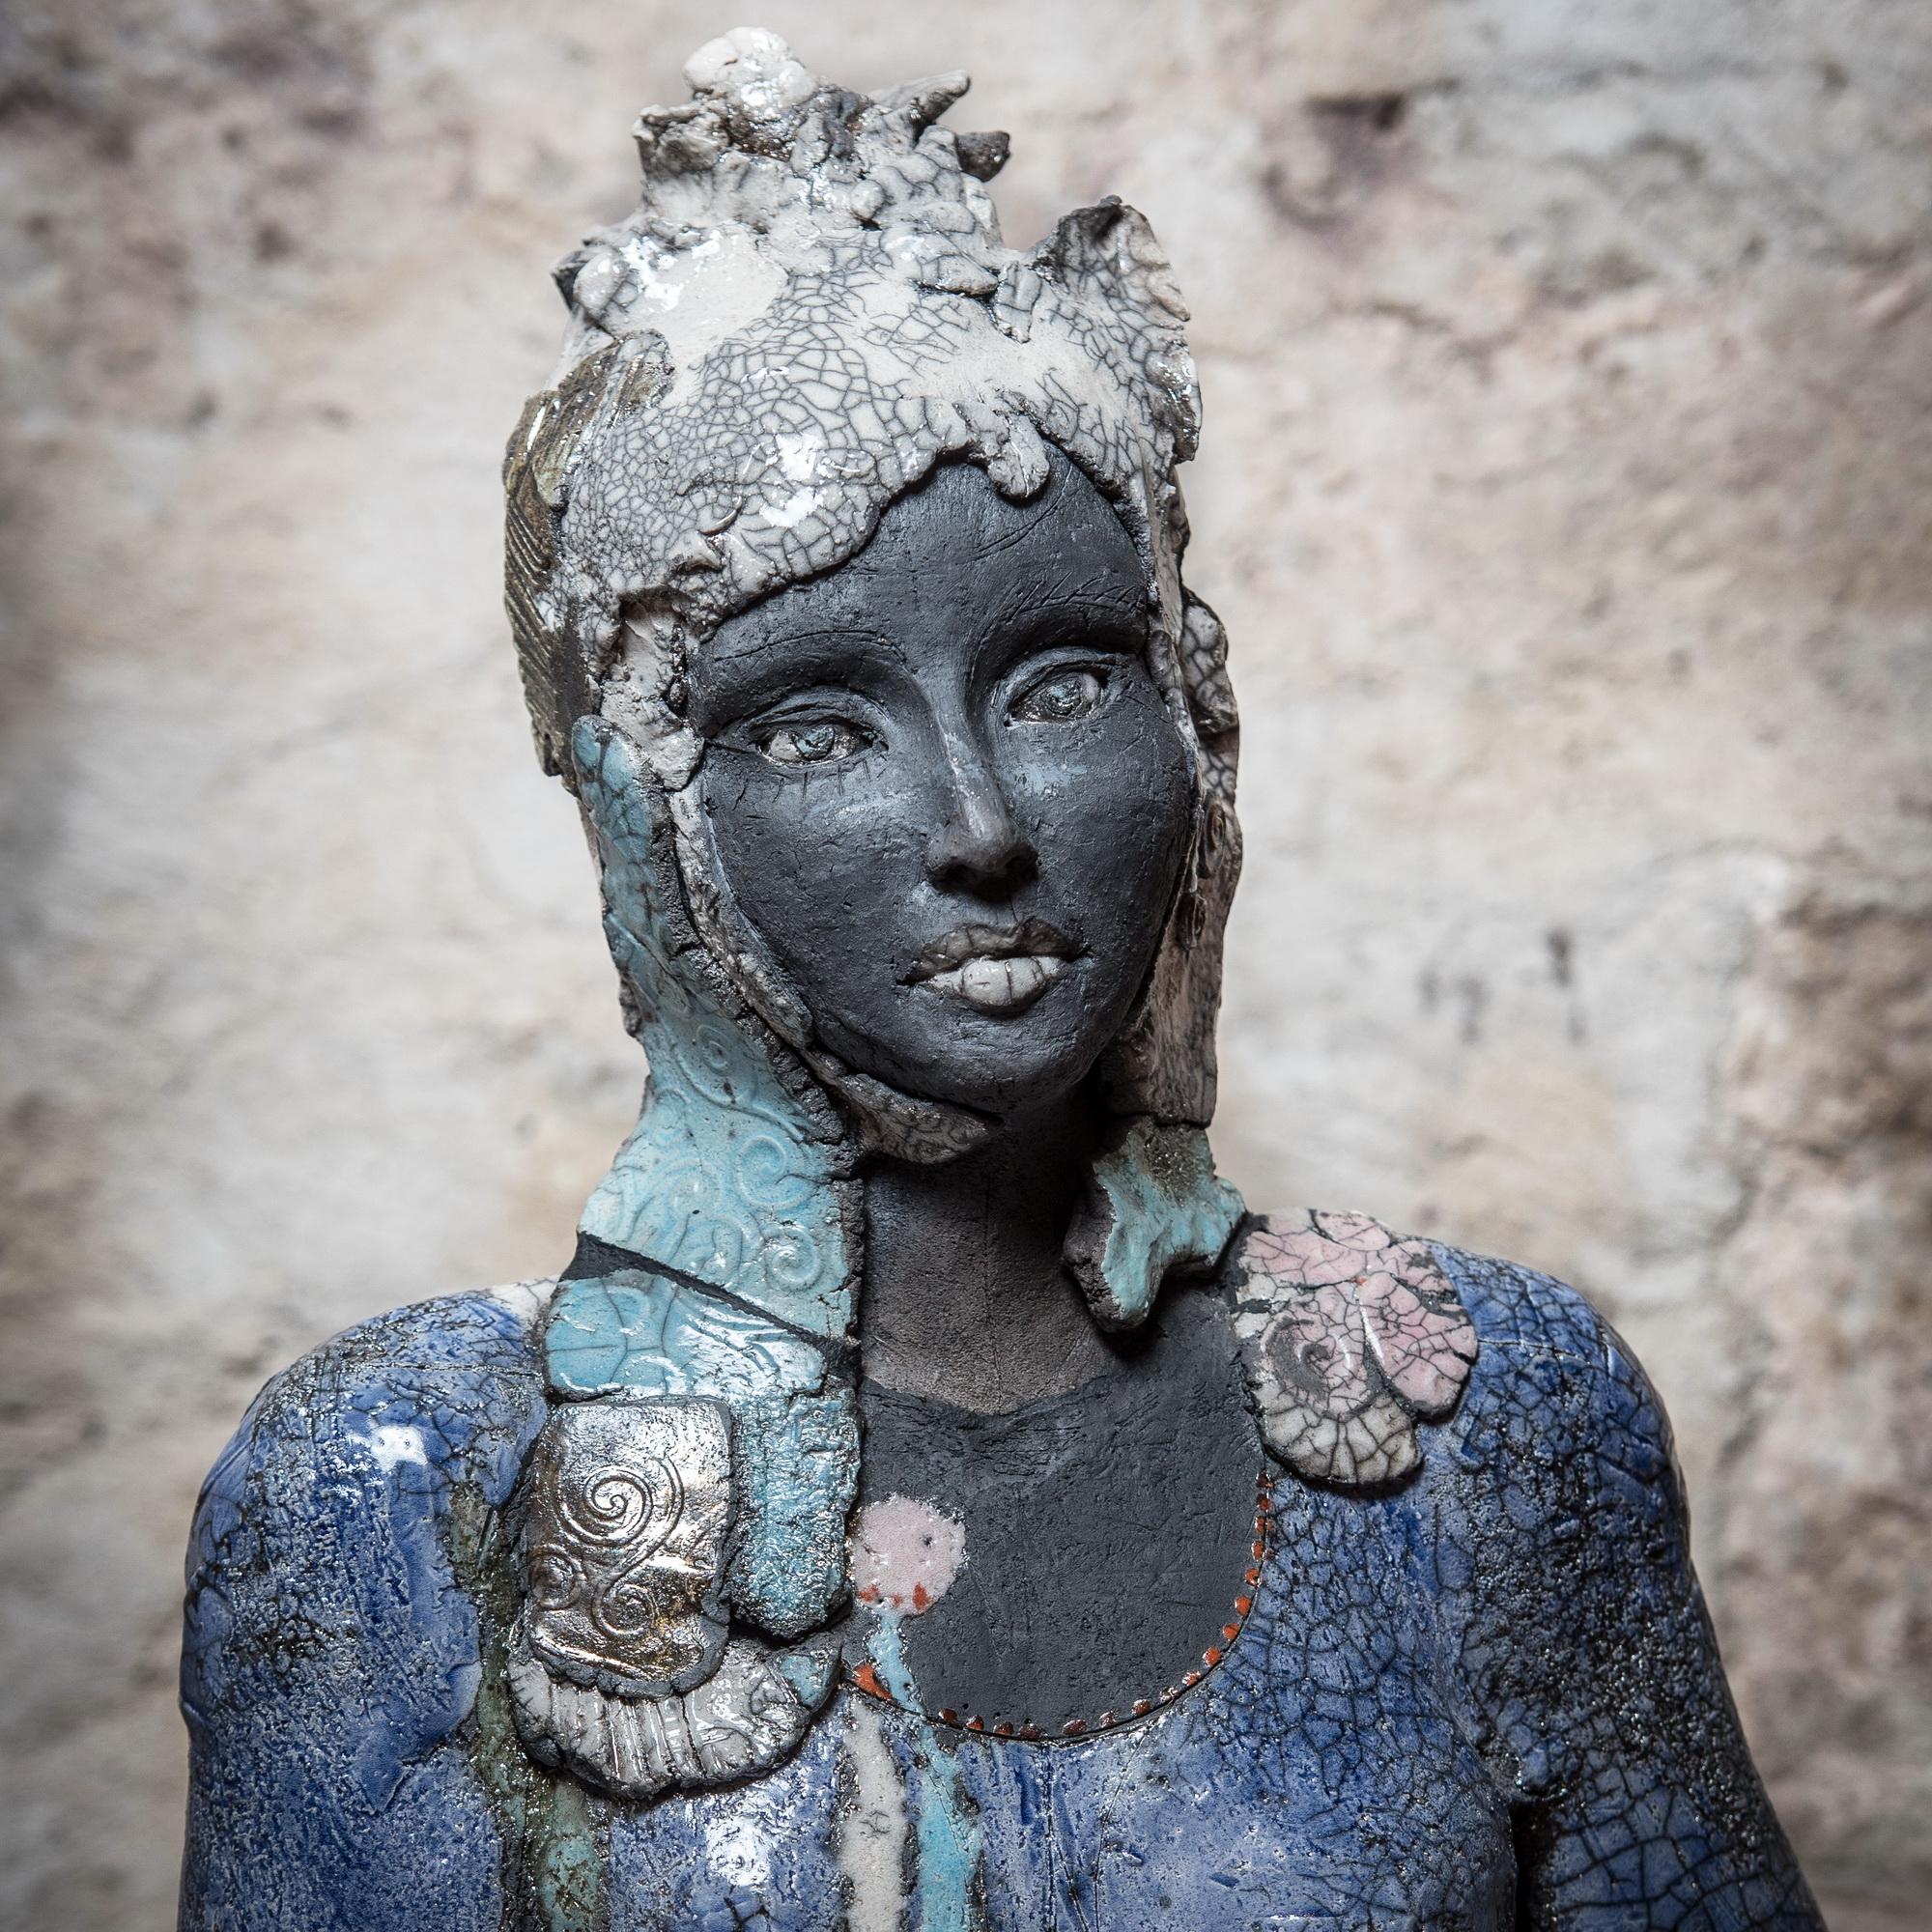 Raku Skulptur Aus Keramik Elsa Gaby Puhmeyer Gaby Puhmeyer